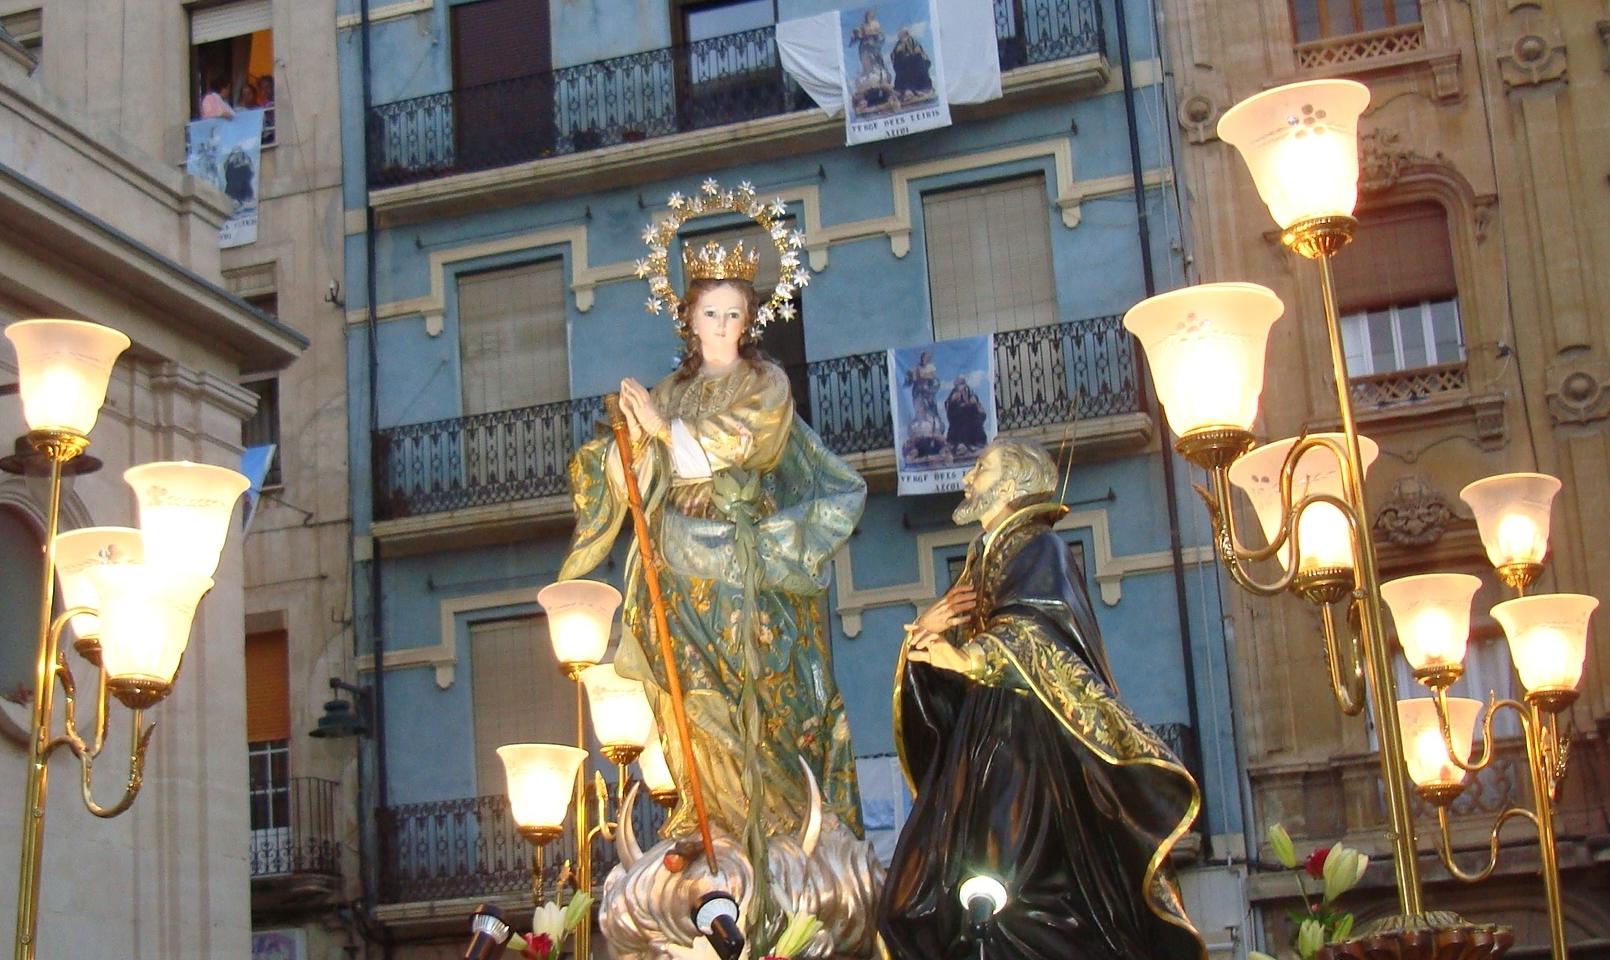 Virgen de los Lirios de Alcoy,  Aparecen Lirios milagrosamente, España (21 ago, 3º dom sep)